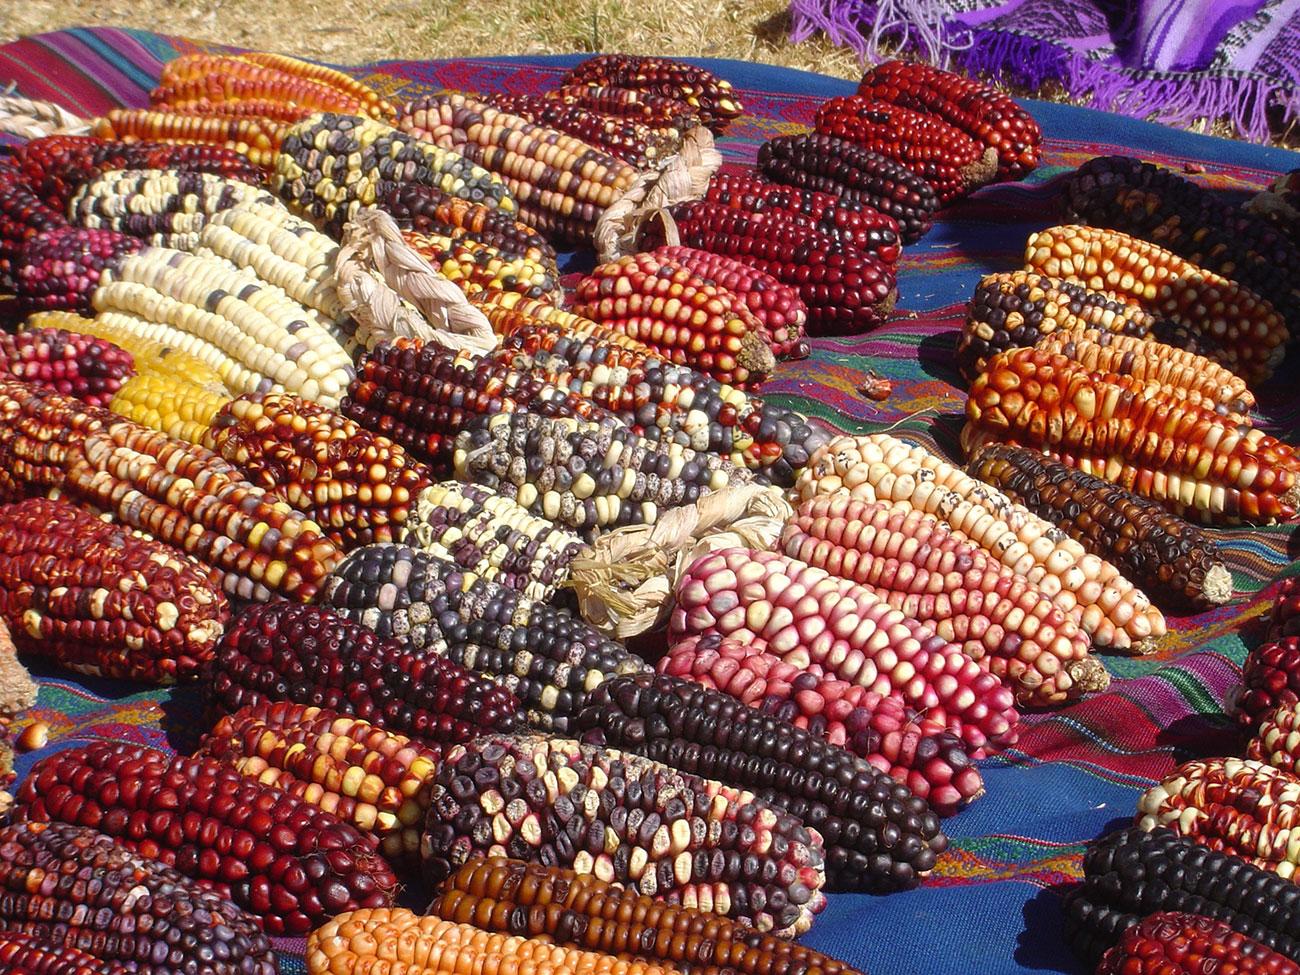 Growing Corn the Inca Way